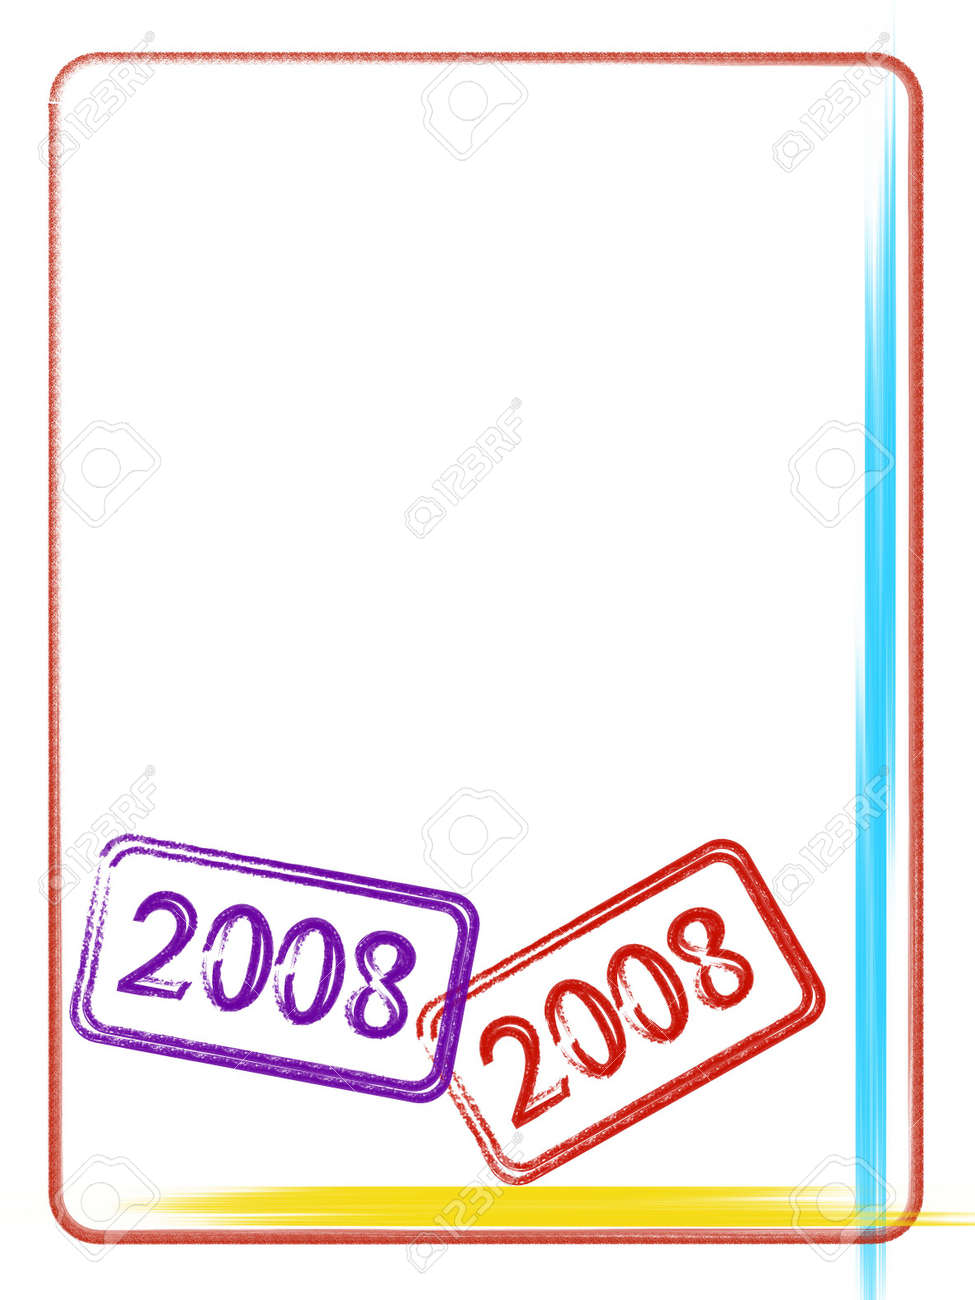 2008 Background Stock Photo - 2478401